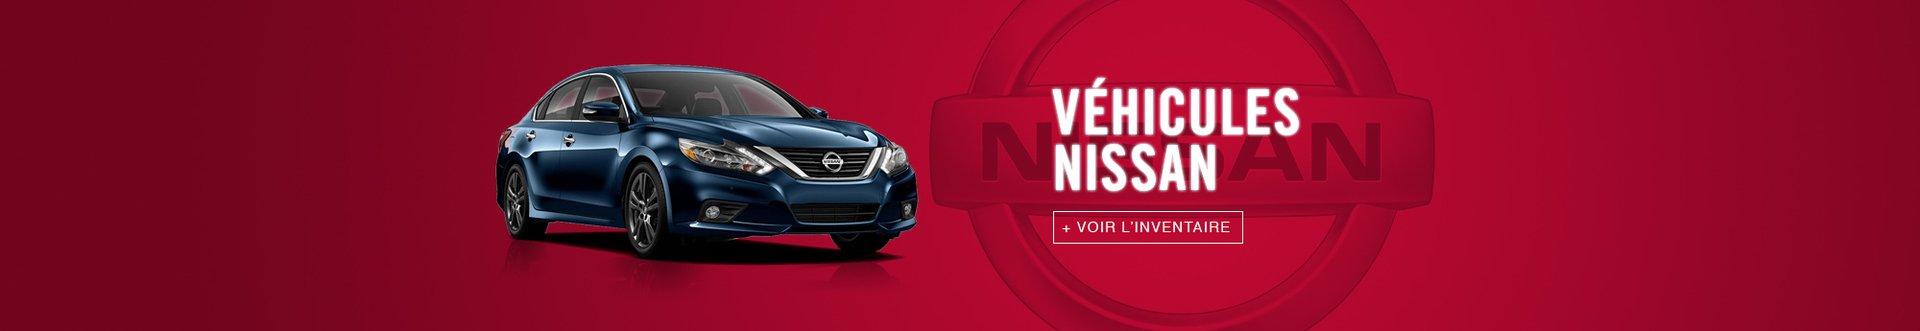 Groupe Grand Portage Concessionnaire Volkswagen Nissan